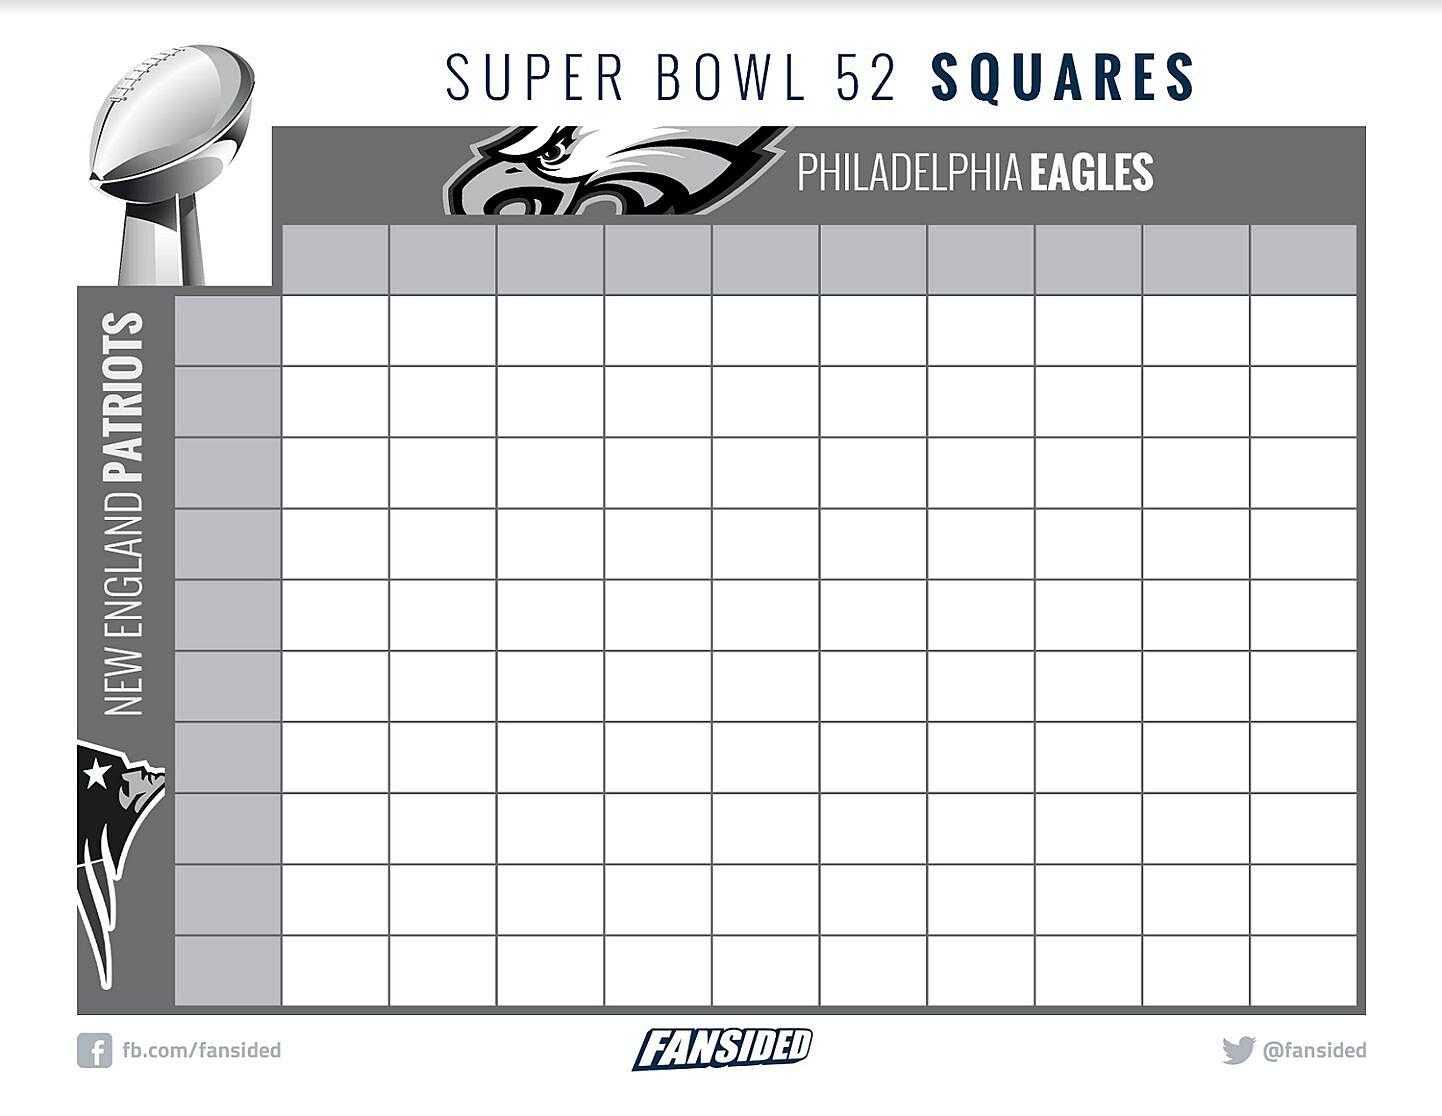 Super bowl 52 bingo and squares next top 25 super bowl moments of all time maxwellsz